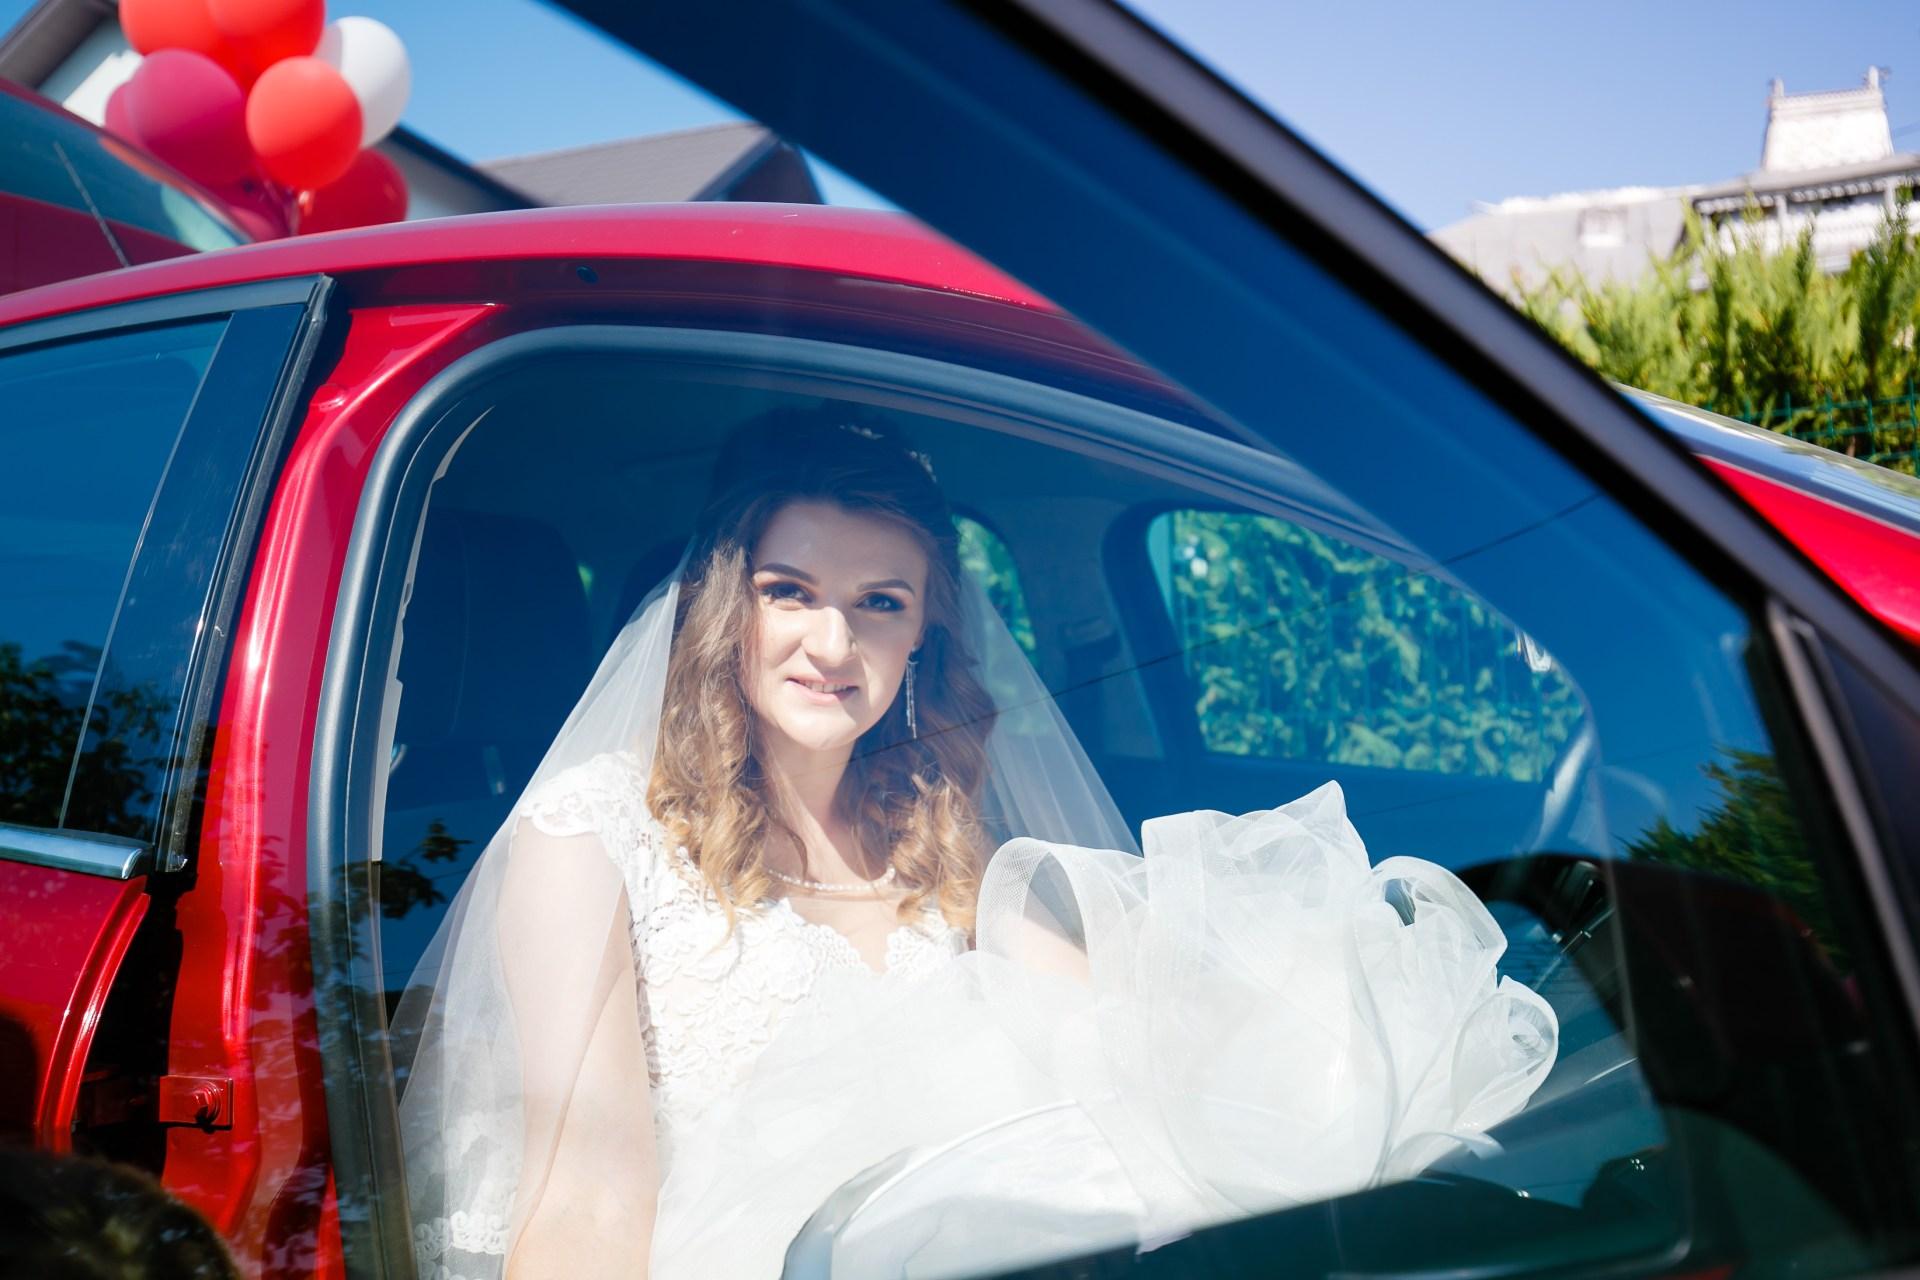 Alexandra si Vlad nunta Pleiada Iasi - mireasa in masina in drum spre cununia religiosa - fotograf profesionist nunta www.paulpadurariu.ro © 2017 Paul Padurariu